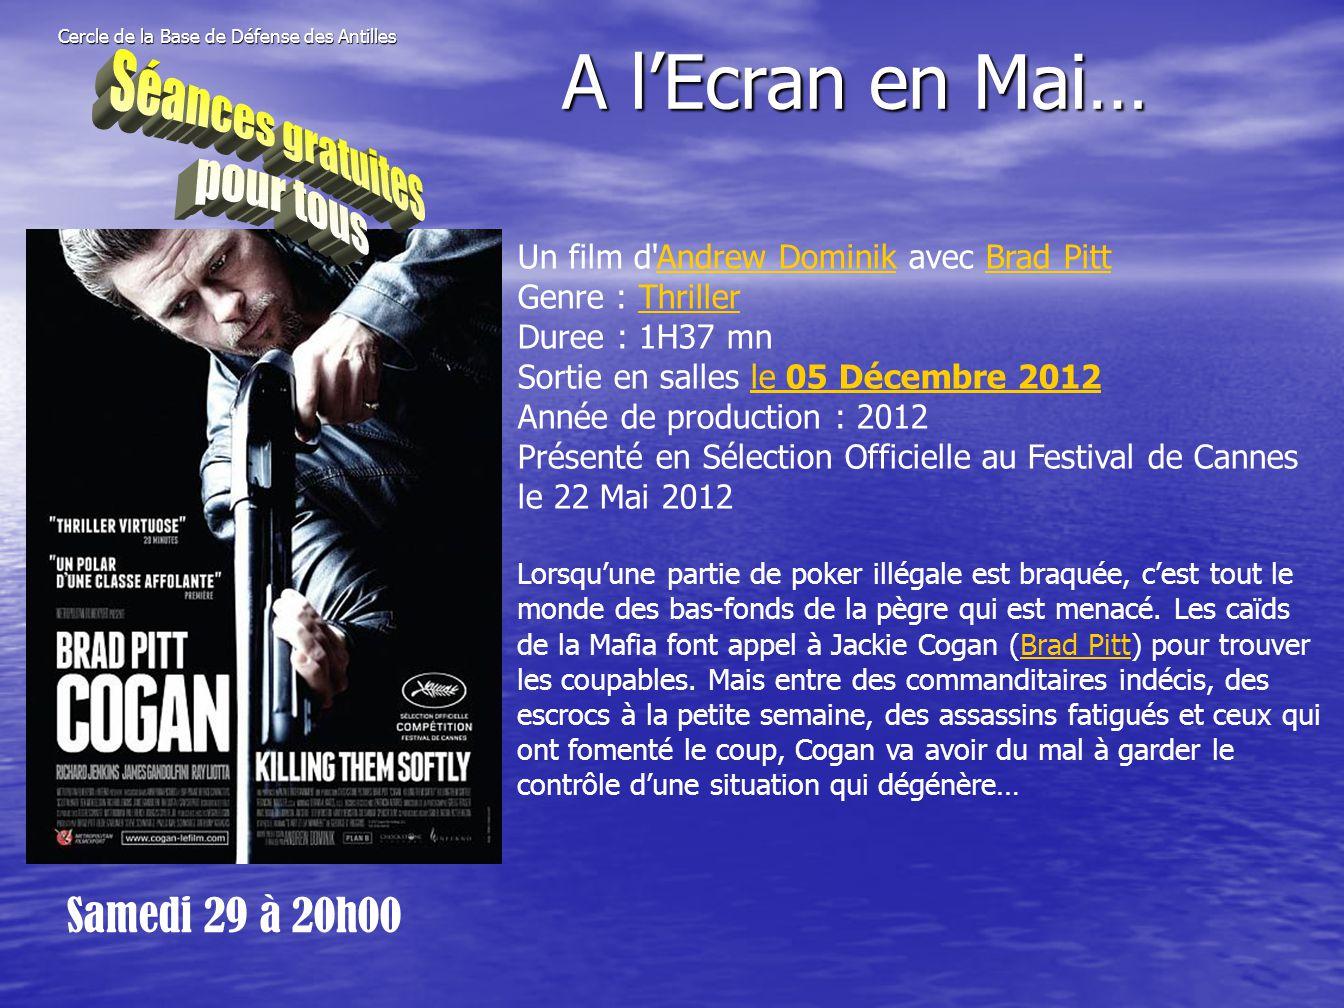 Cercle de la Base de Défense des Antilles Samedi 29 à 20h00 A l'Ecran en Mai… Un film d'Andrew Dominik avec Brad PittAndrew DominikBrad Pitt Genre : T